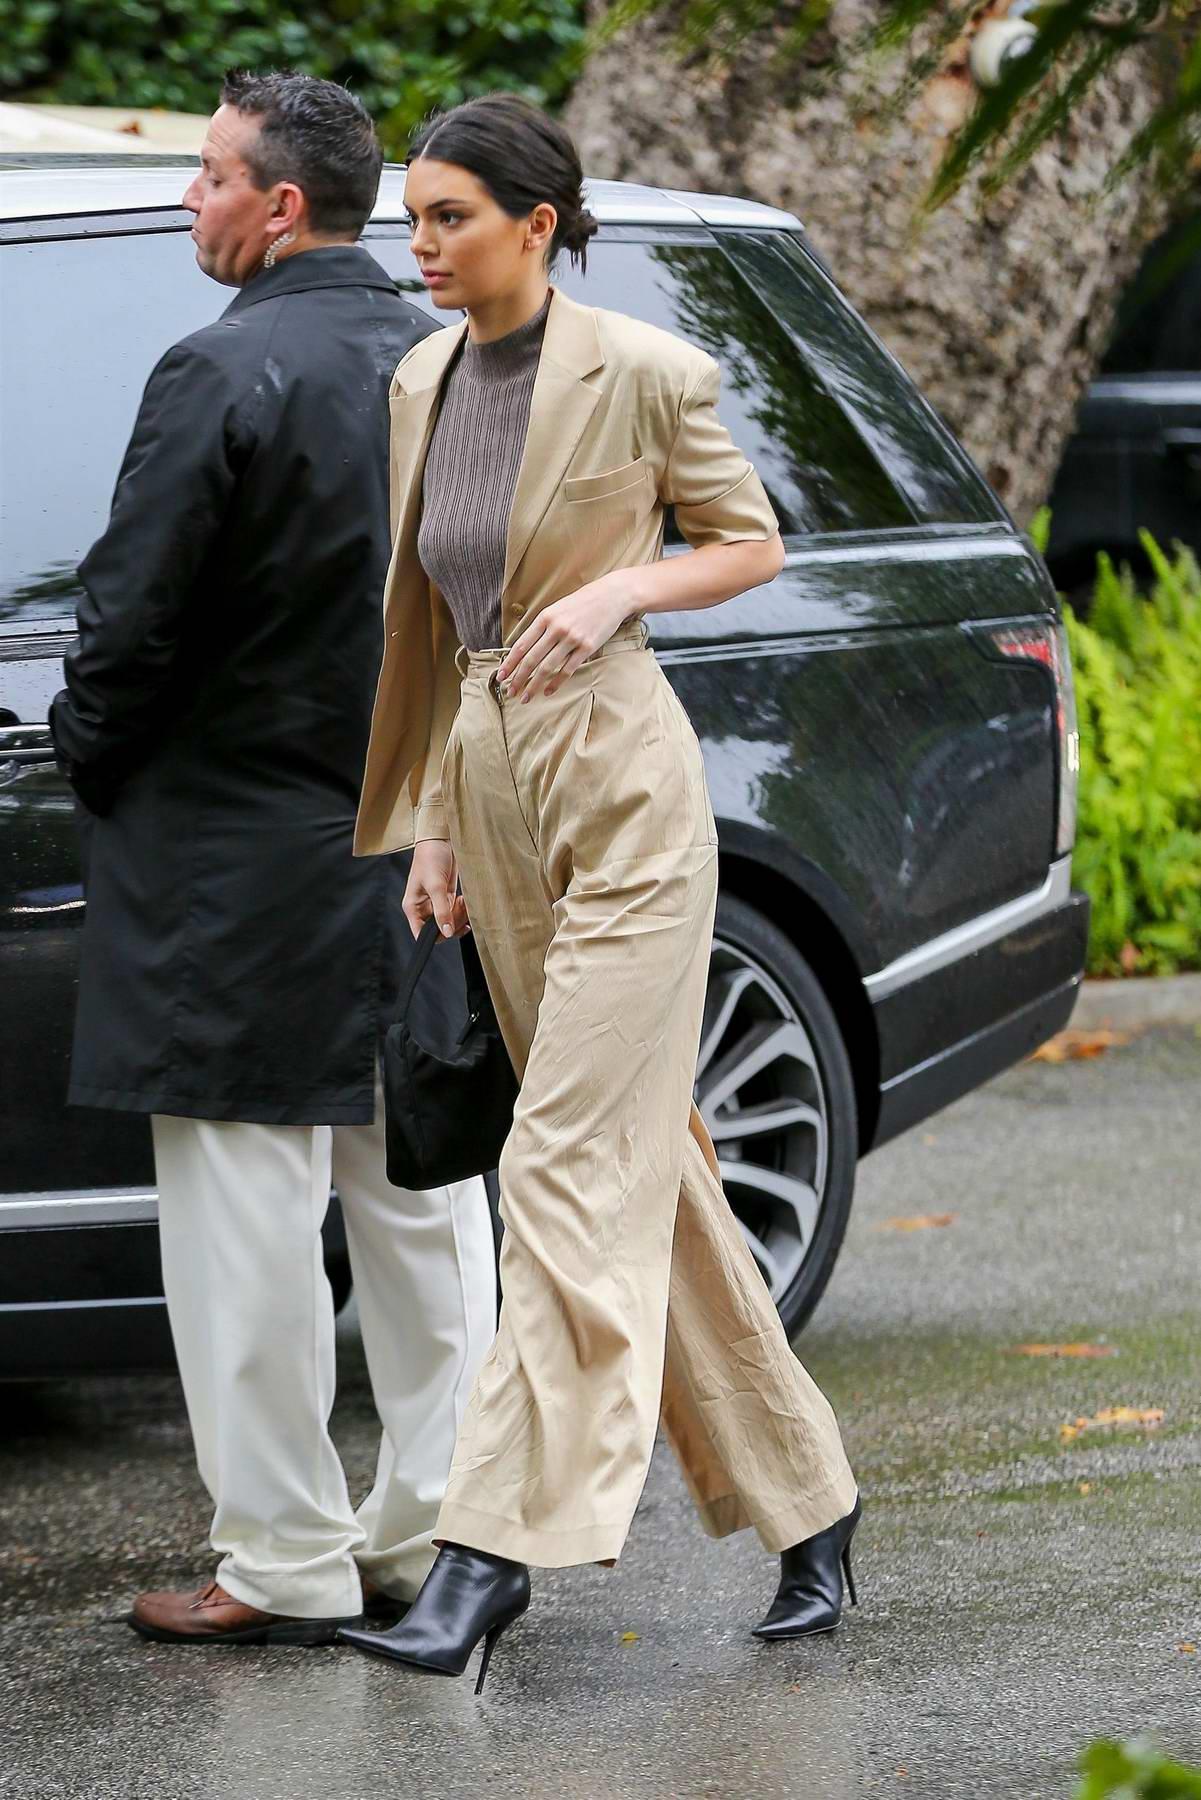 Kendall Jenner arrives at Khloe Kardashian's baby shower in Bel Air, Los Angeles